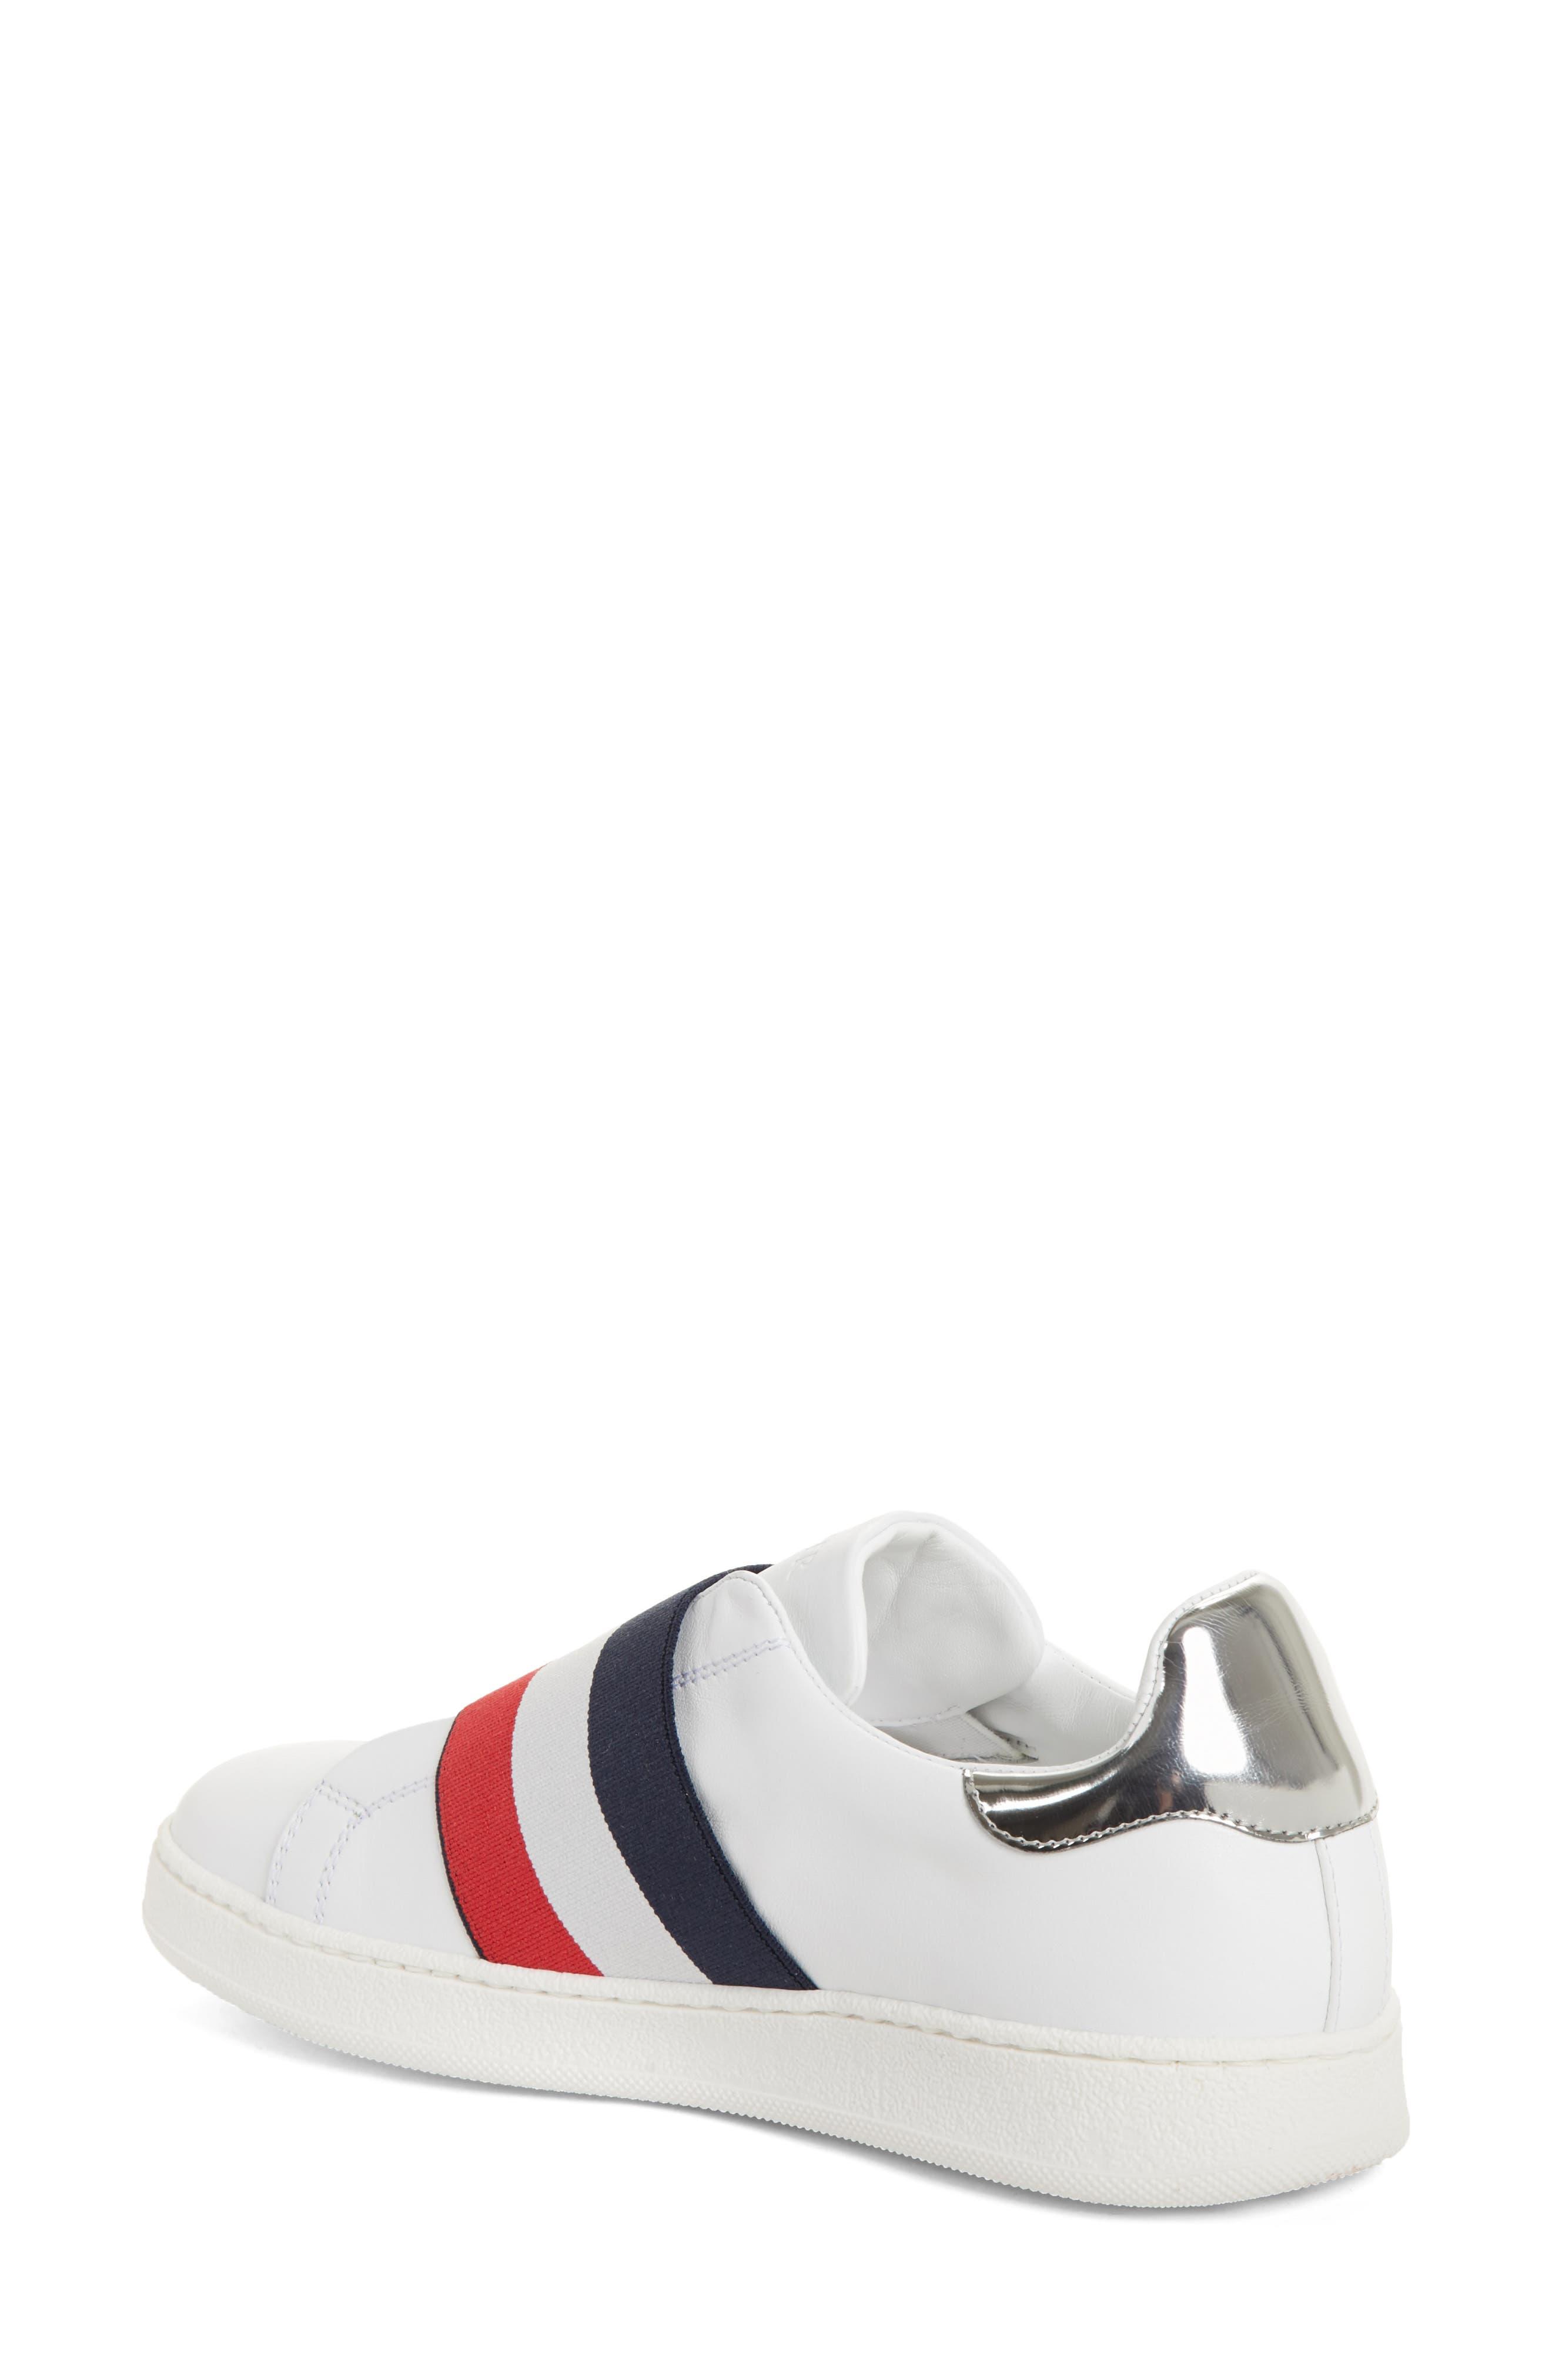 Alternate Image 2  - Moncler Alizee Low Top Sneaker (Women)